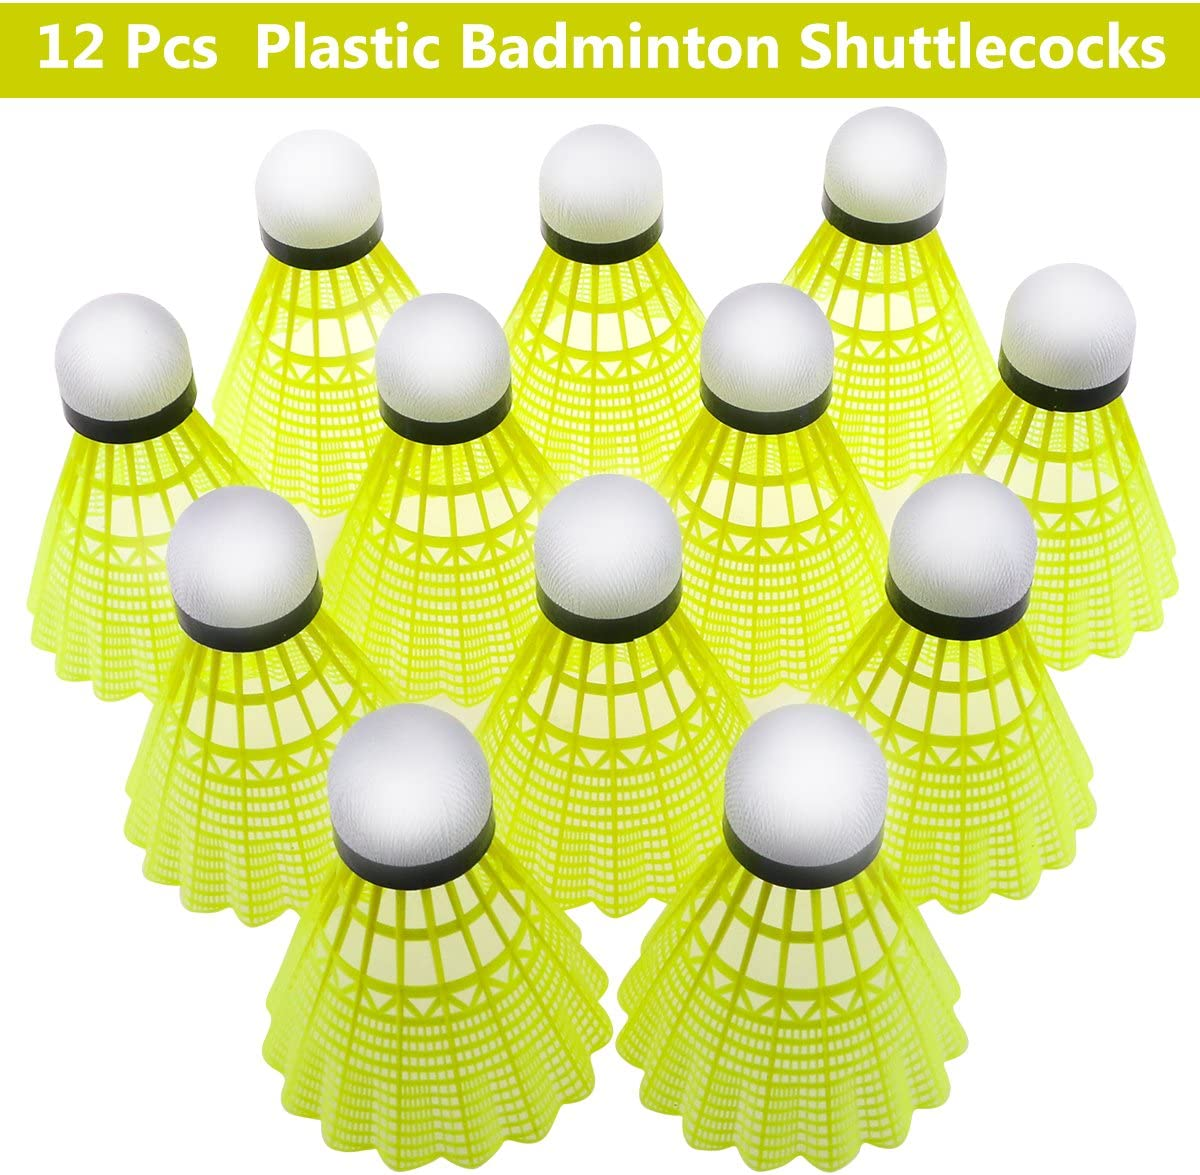 LDA GET Fresh 12Pcs White Badminton Plastic Shuttlecocks Indoor Outdoor Gym Sports Accessories